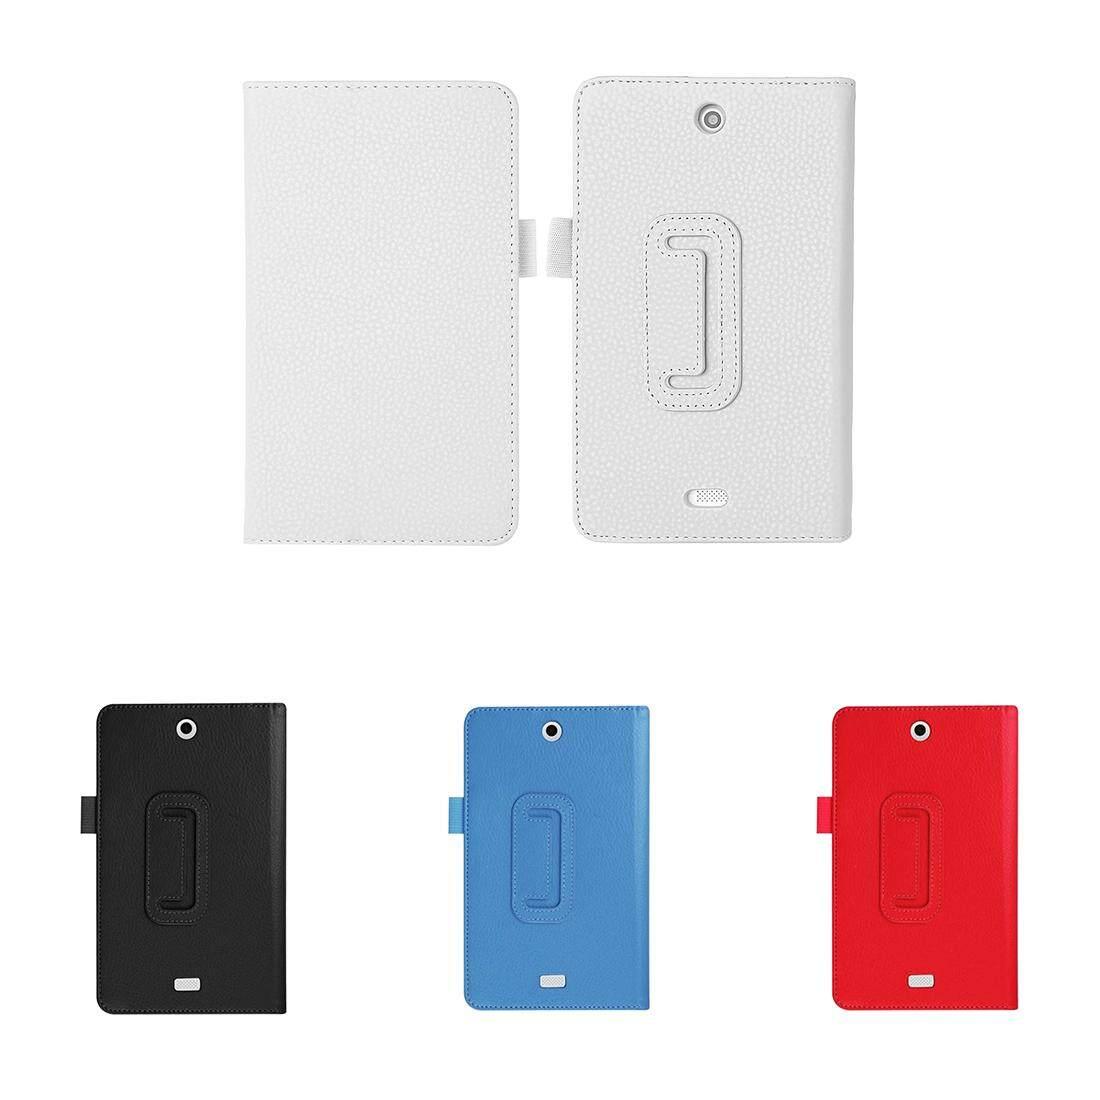 Ramping-Buku Penyangga Sarung Case untuk Acer Iconia Satu B1-770 Tablet 7 Inci-Internasional